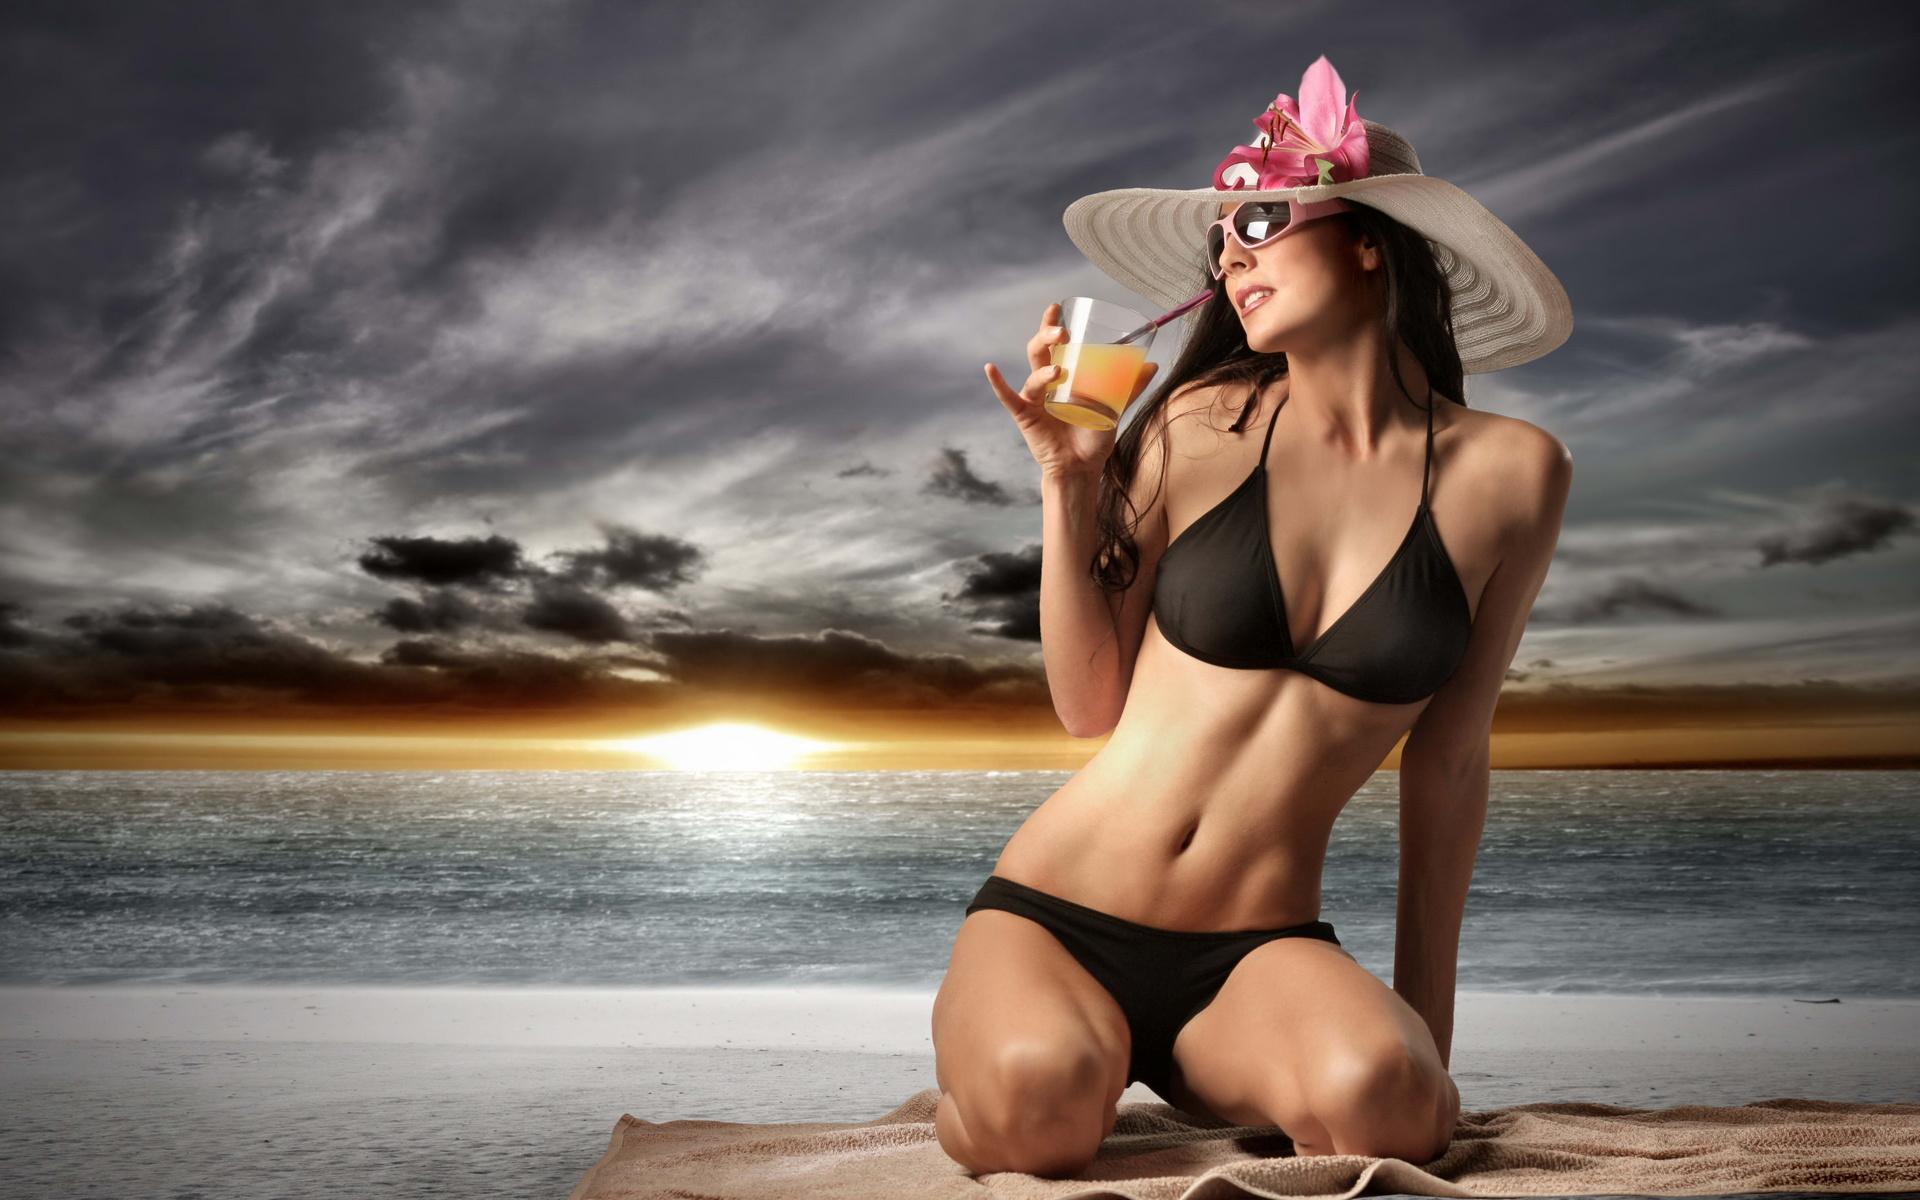 Красивые девушки в бикини на пляже